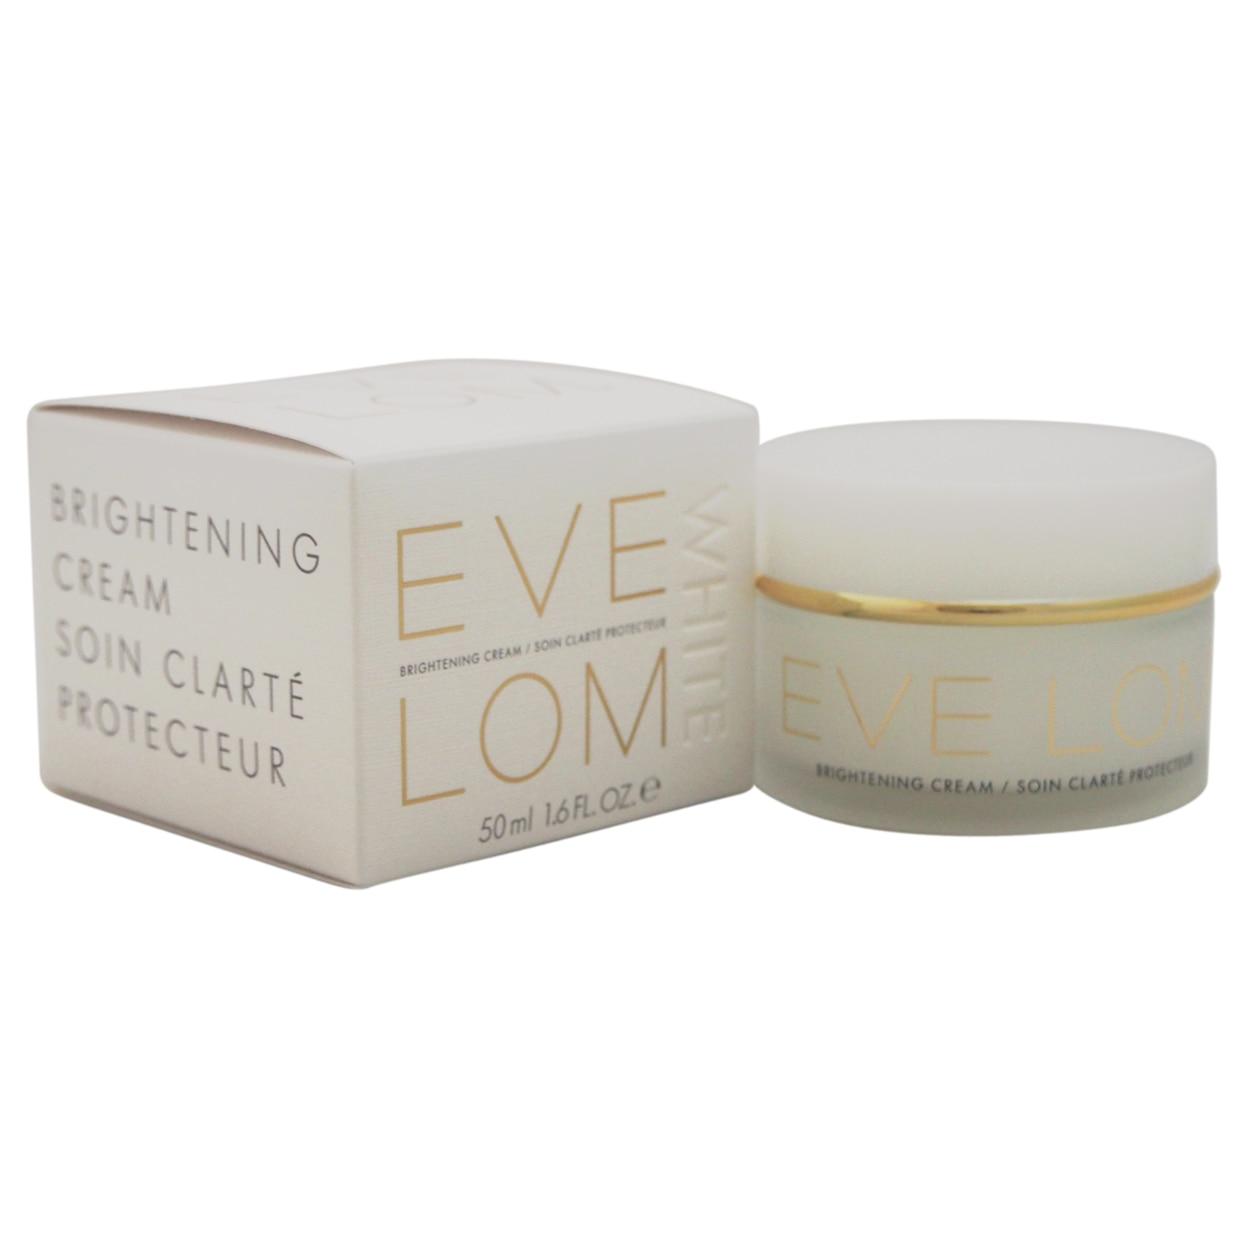 Brightening Cream by Eve Lom for Unisex - 1.6 oz Cream eve lom 125ml page 5